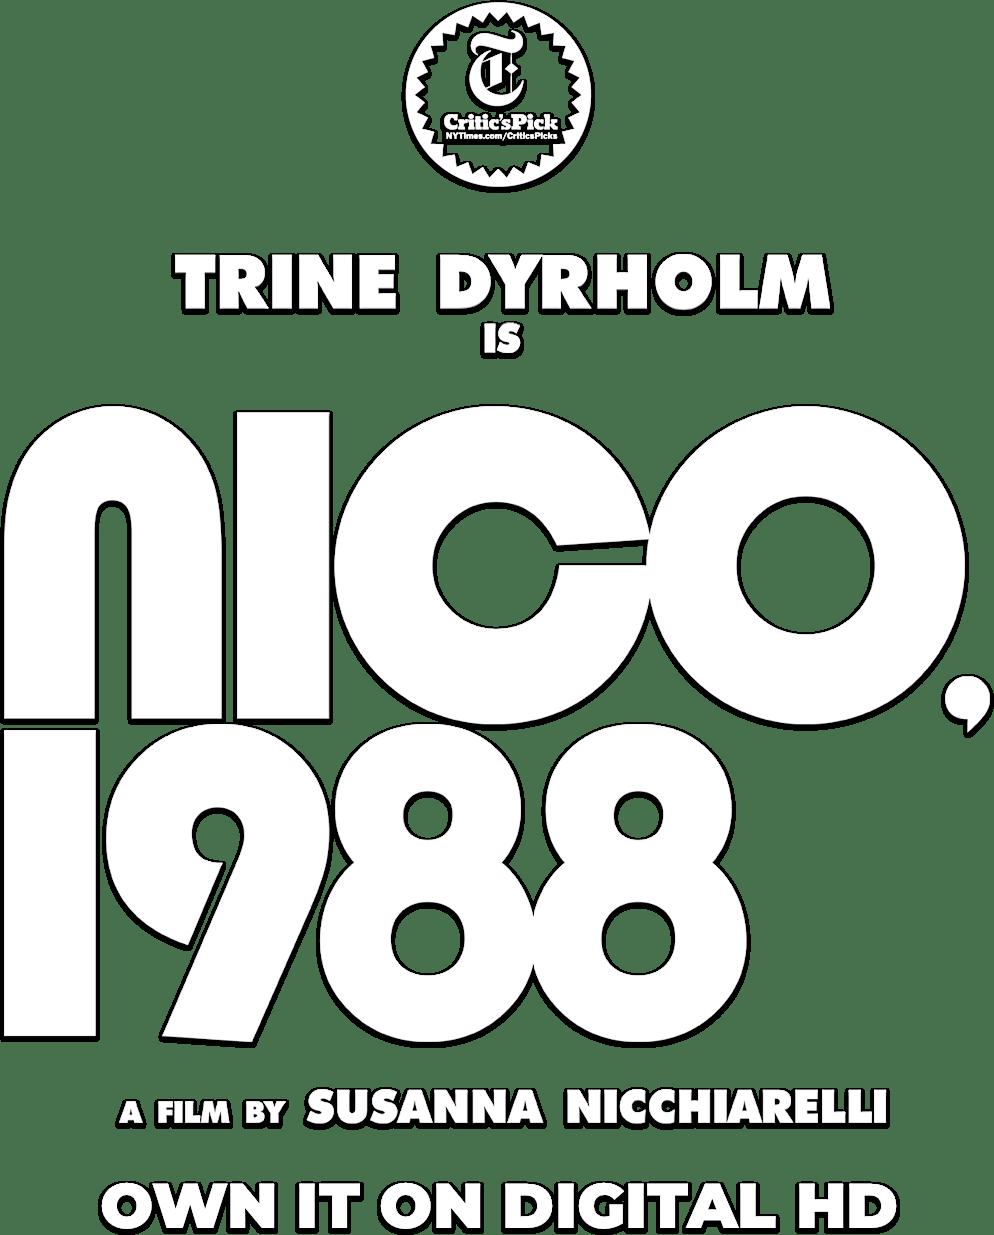 Nico, 1988: Story | Magnolia Pictures